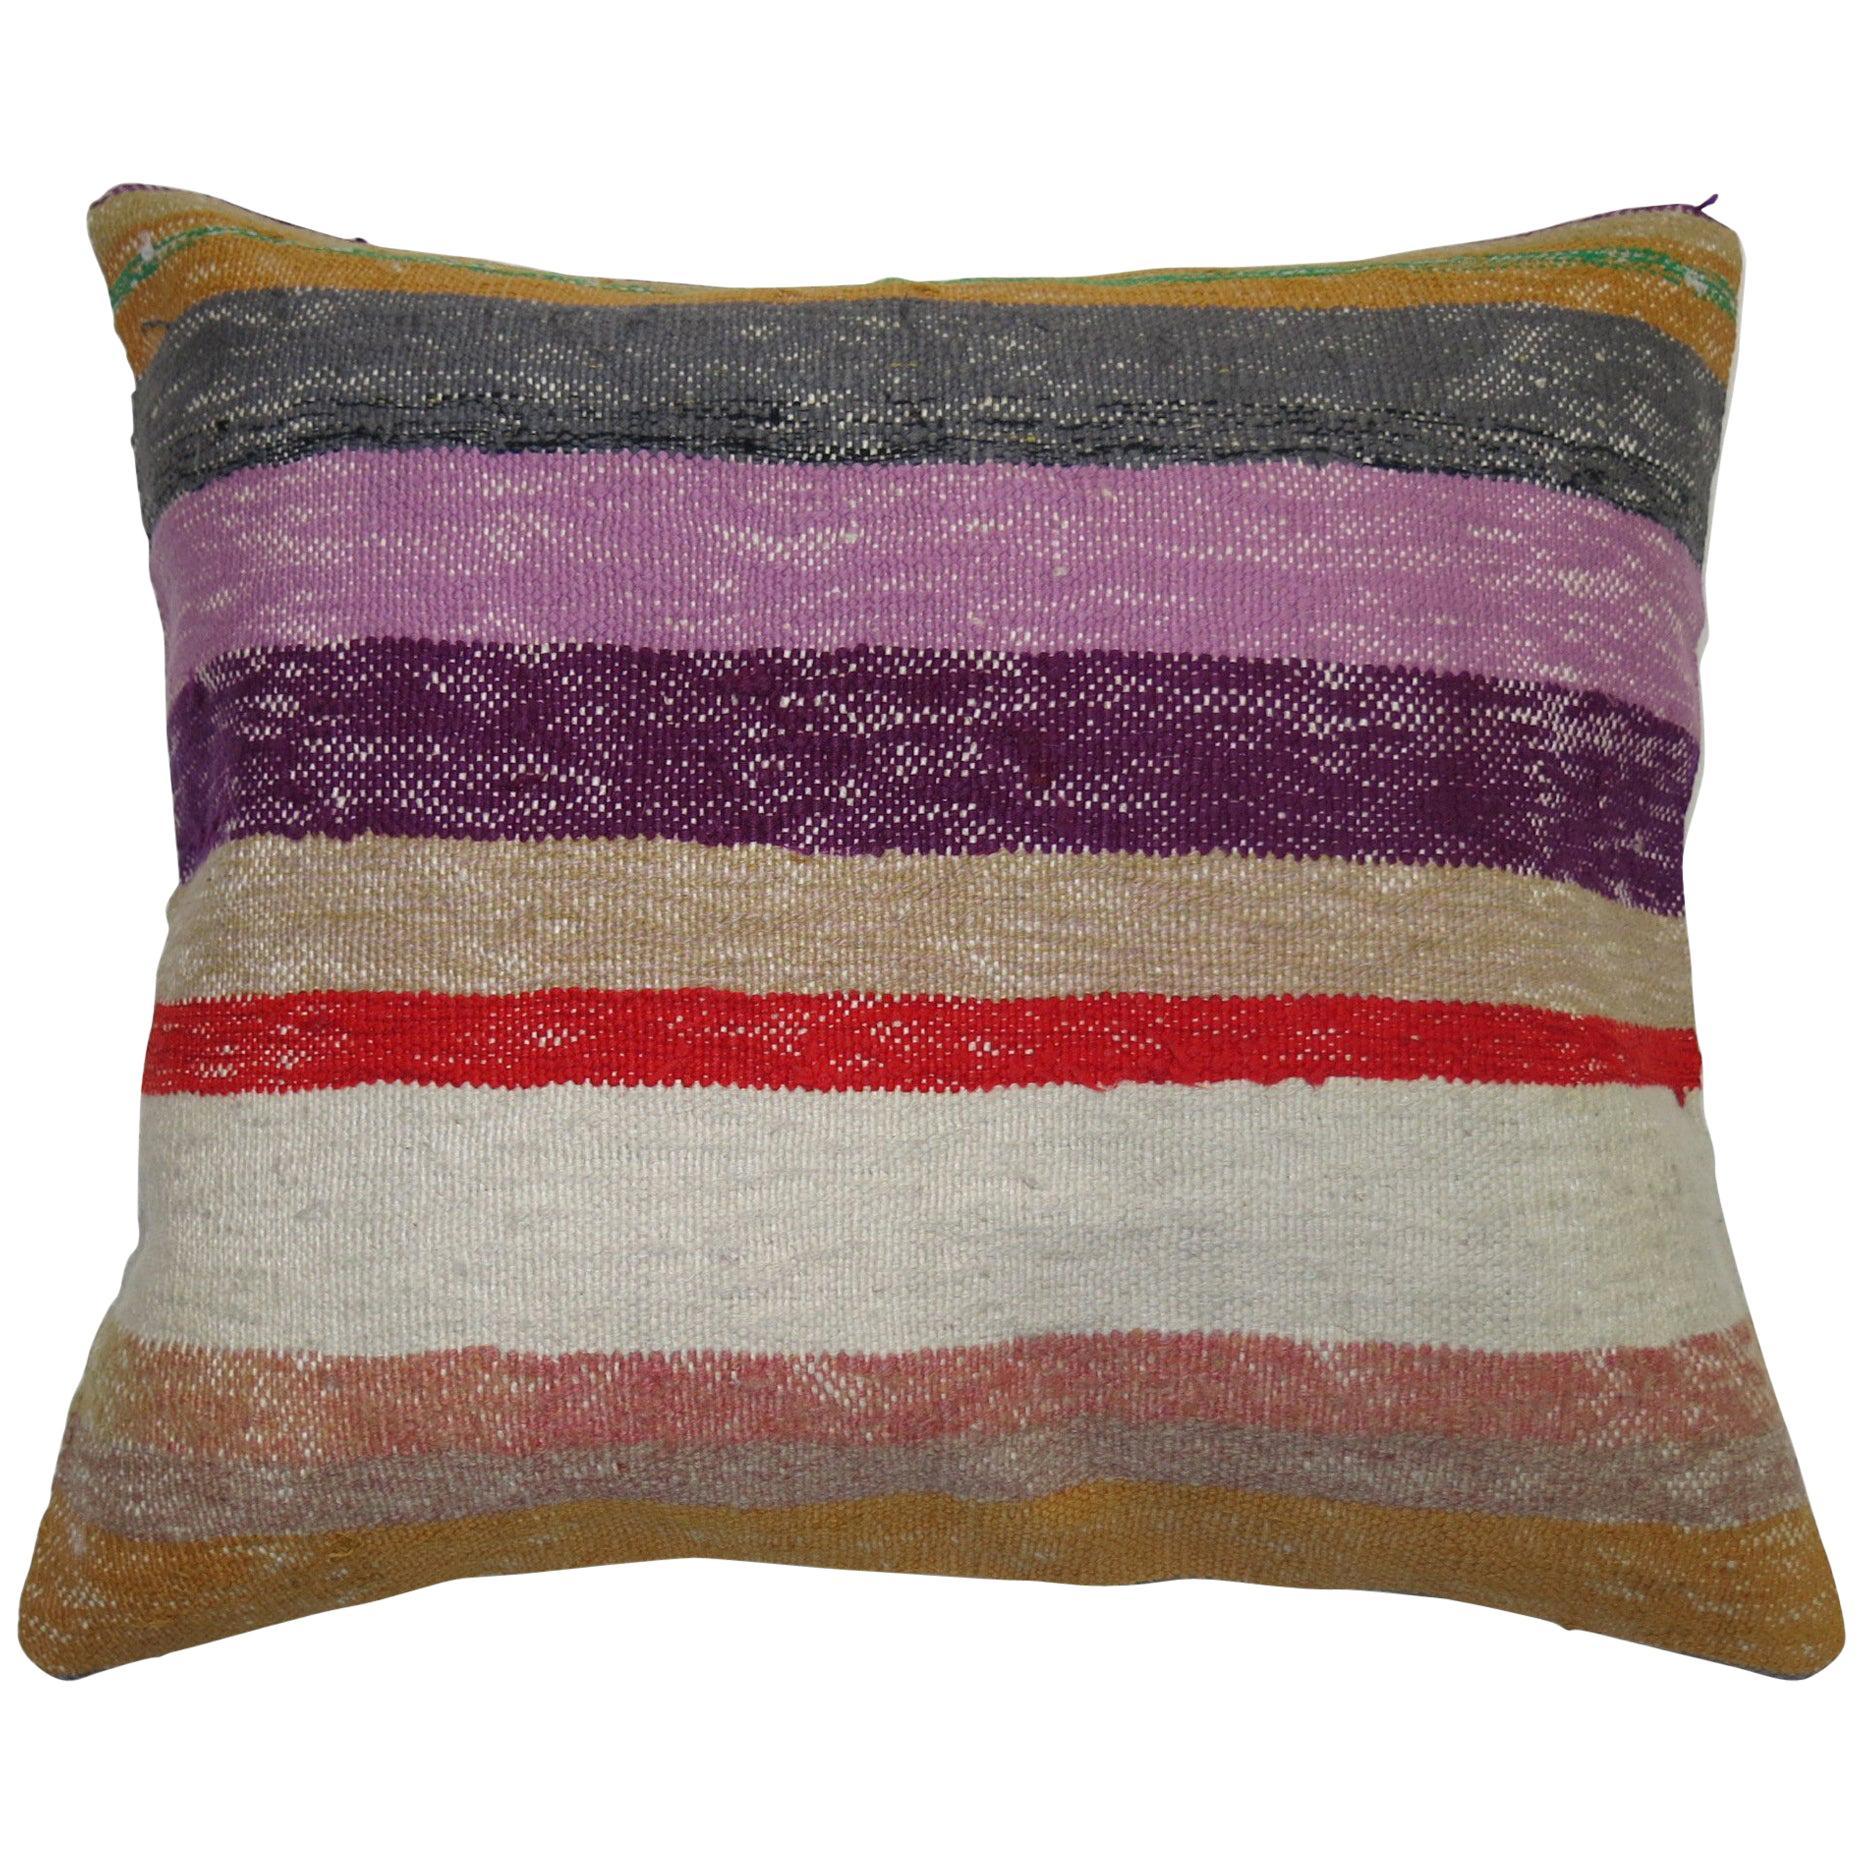 Large Striped Turkish Kilim Pillow